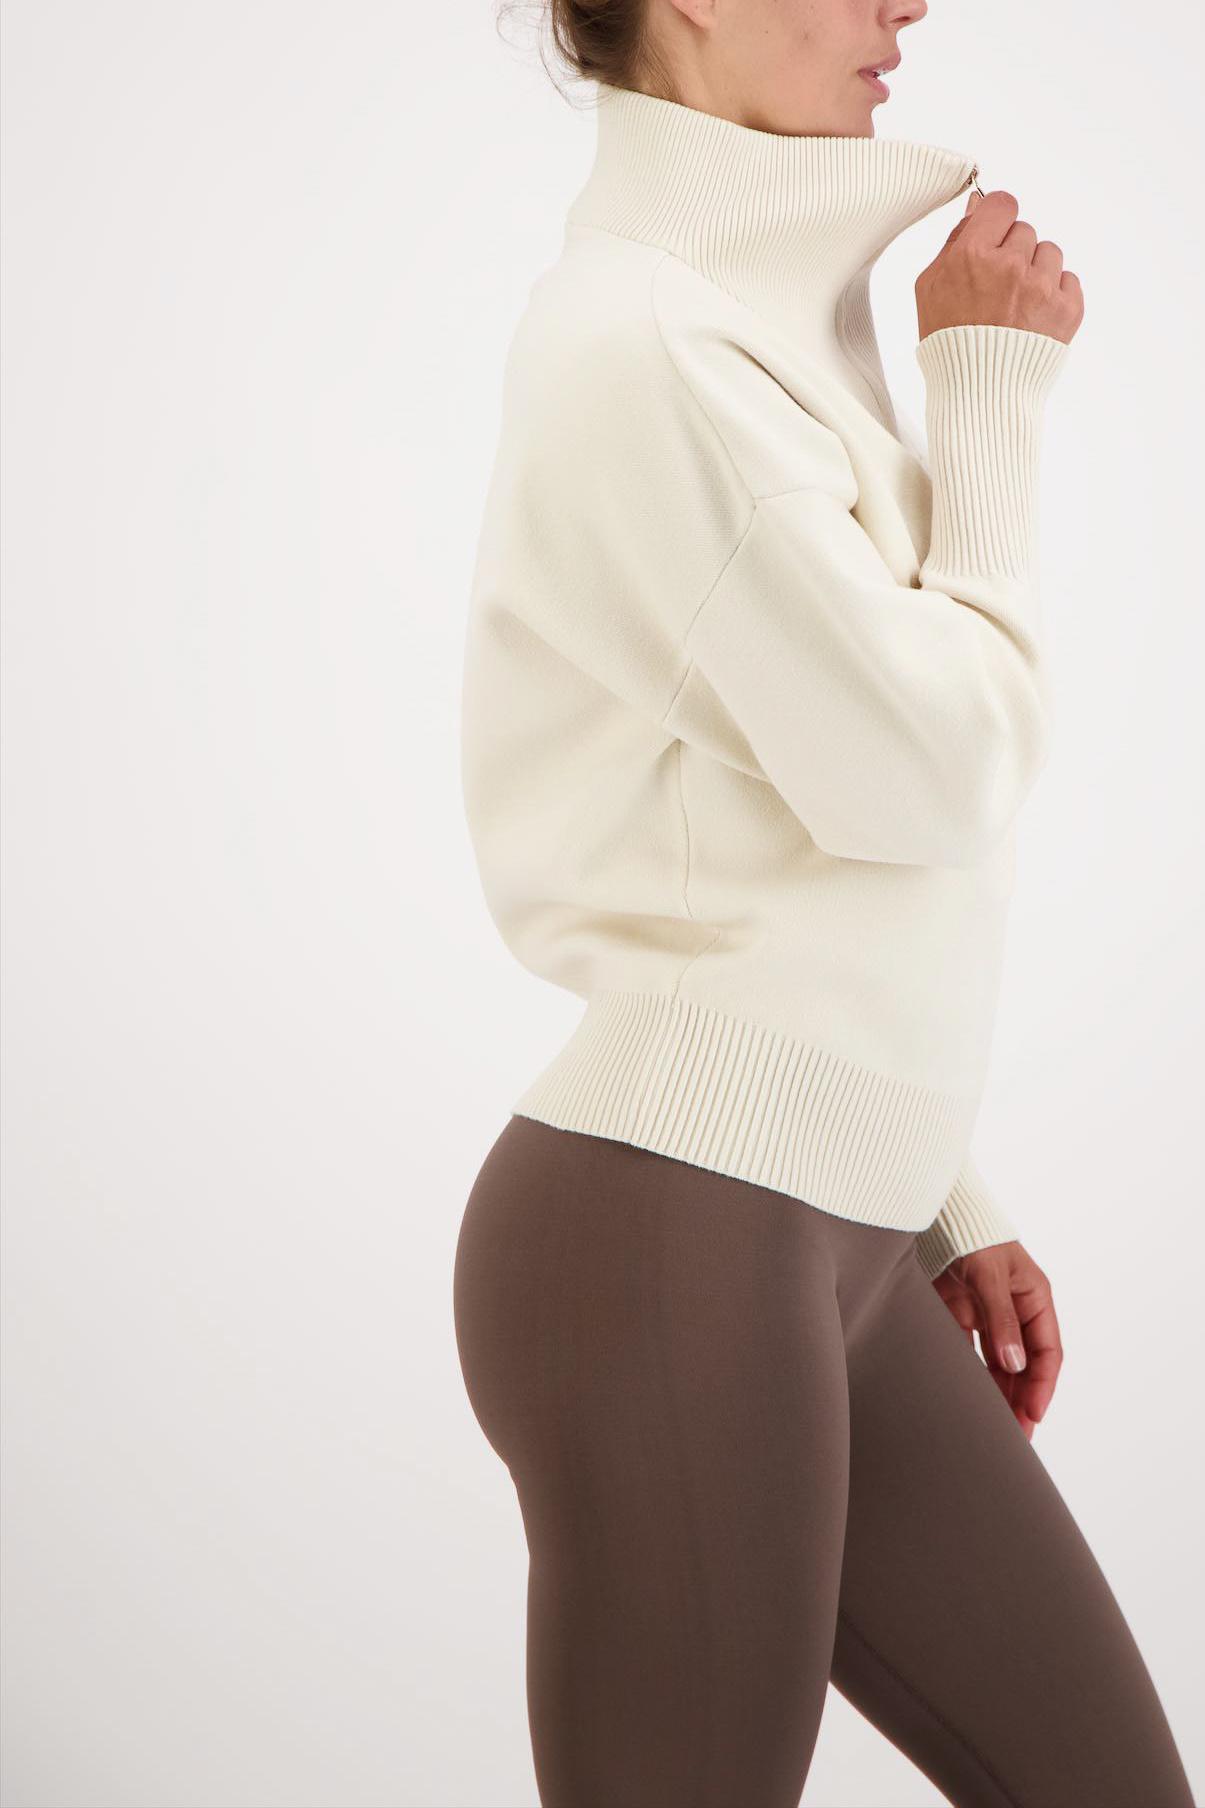 Olly Half-Zip Knit Sweater - Cream White-2